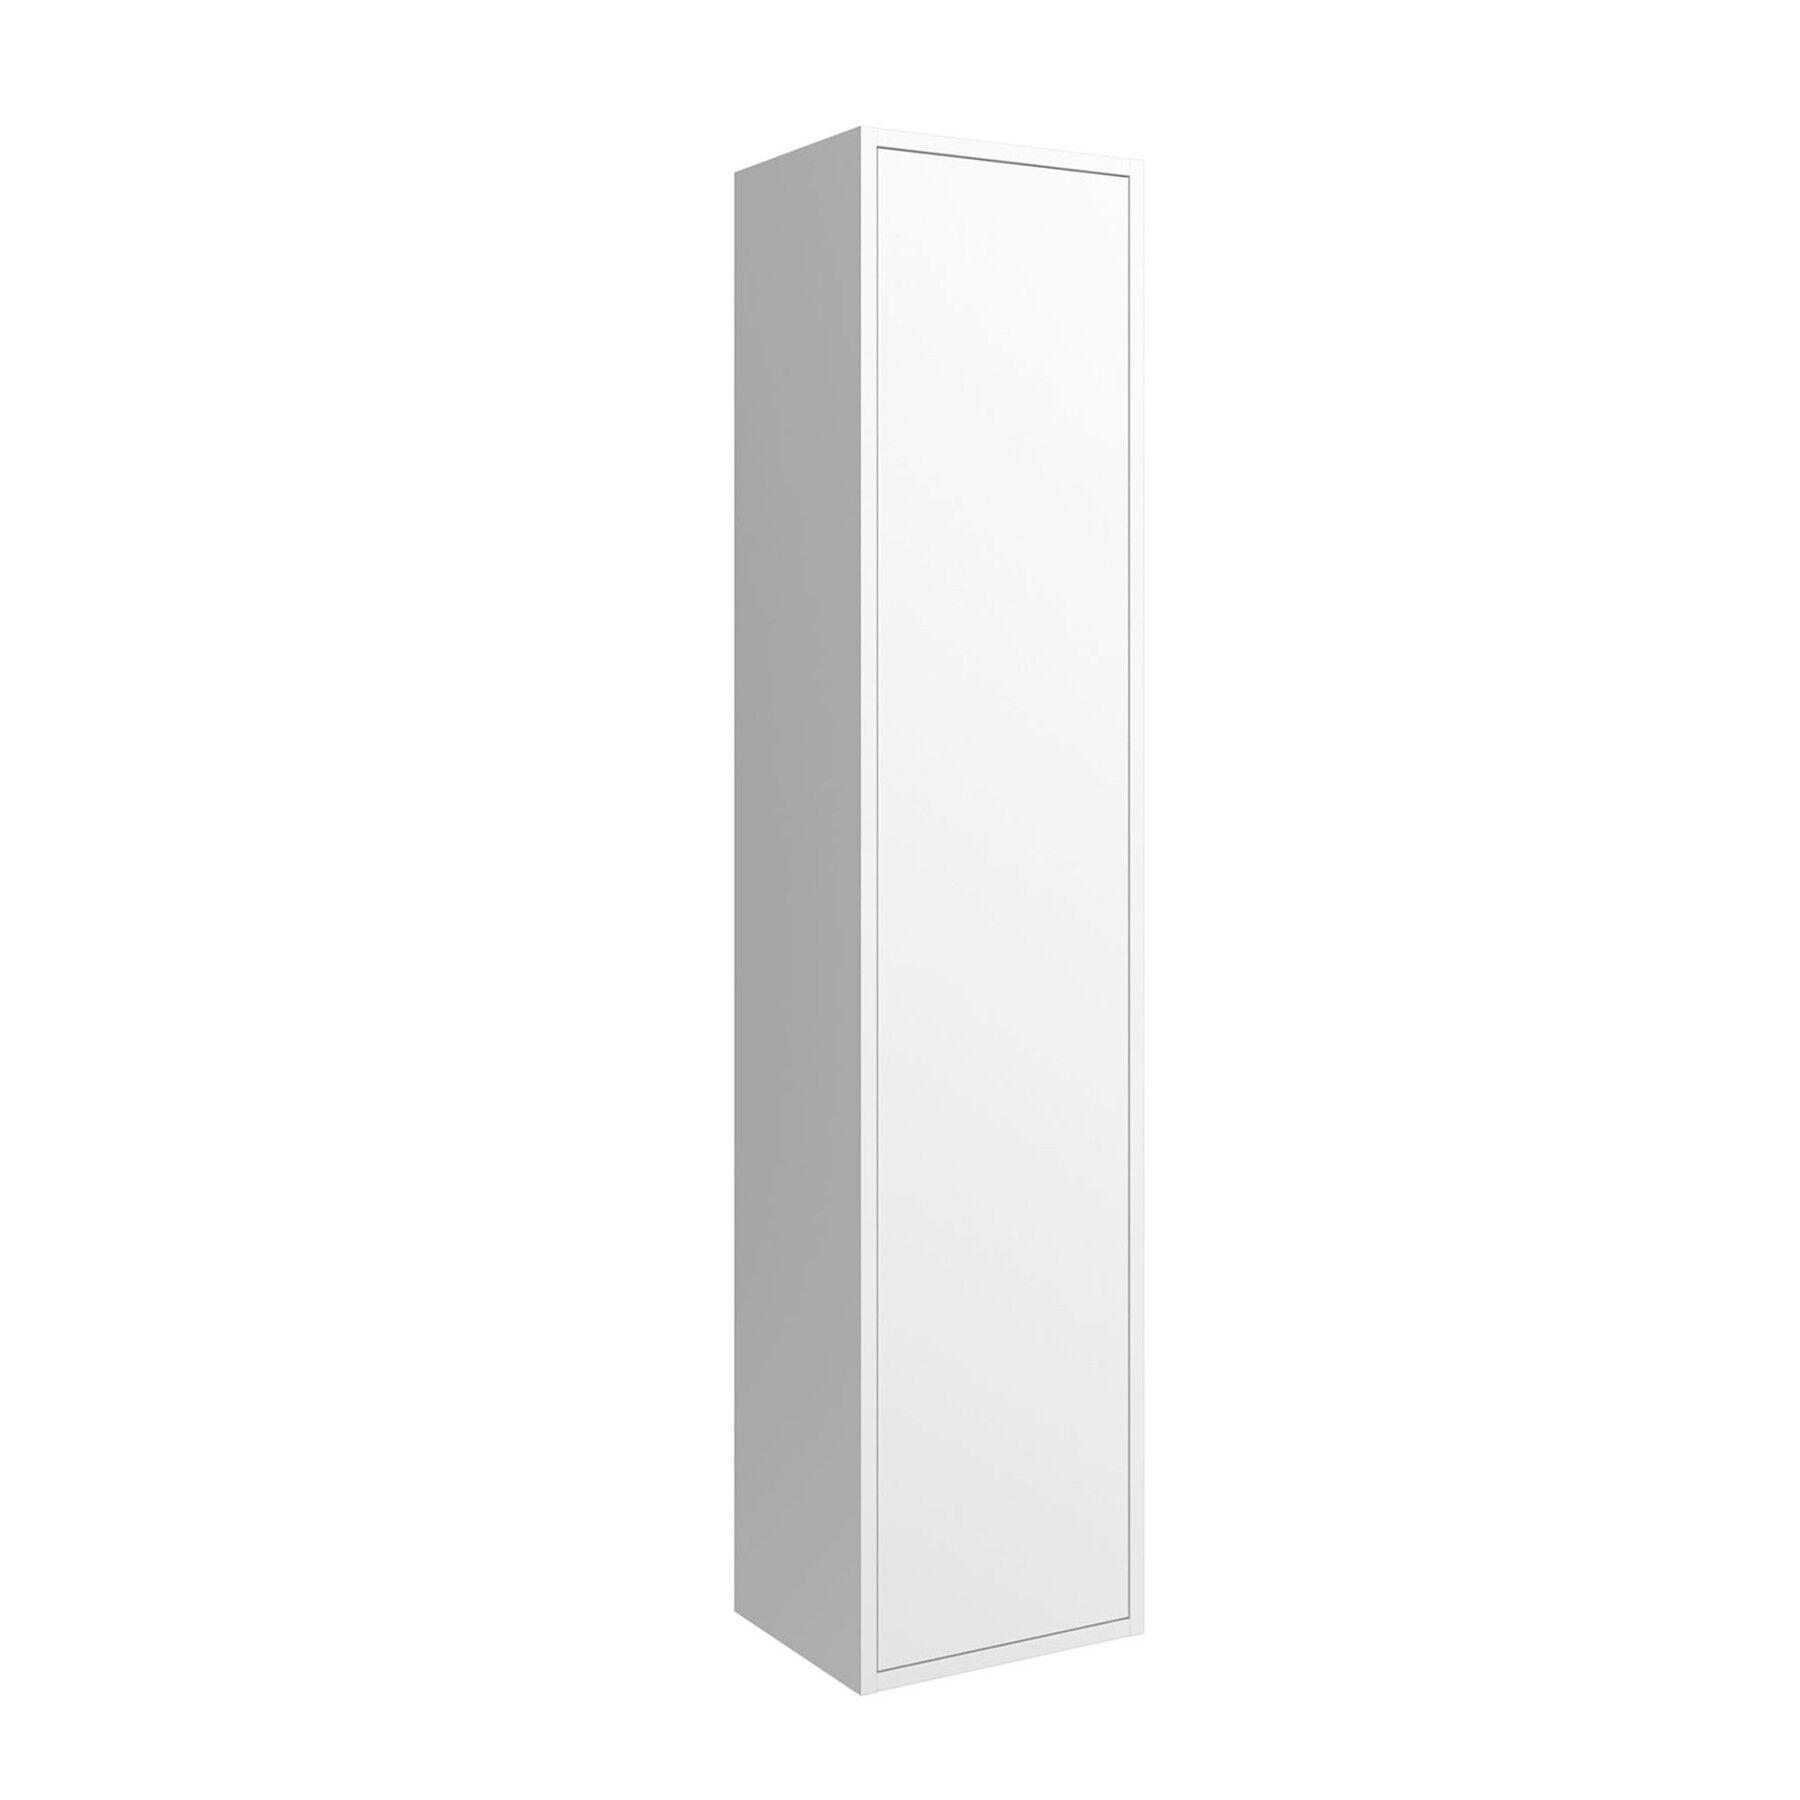 caesaroo colonna bagno sospesa ulisse in legno bianco opaco   bianco